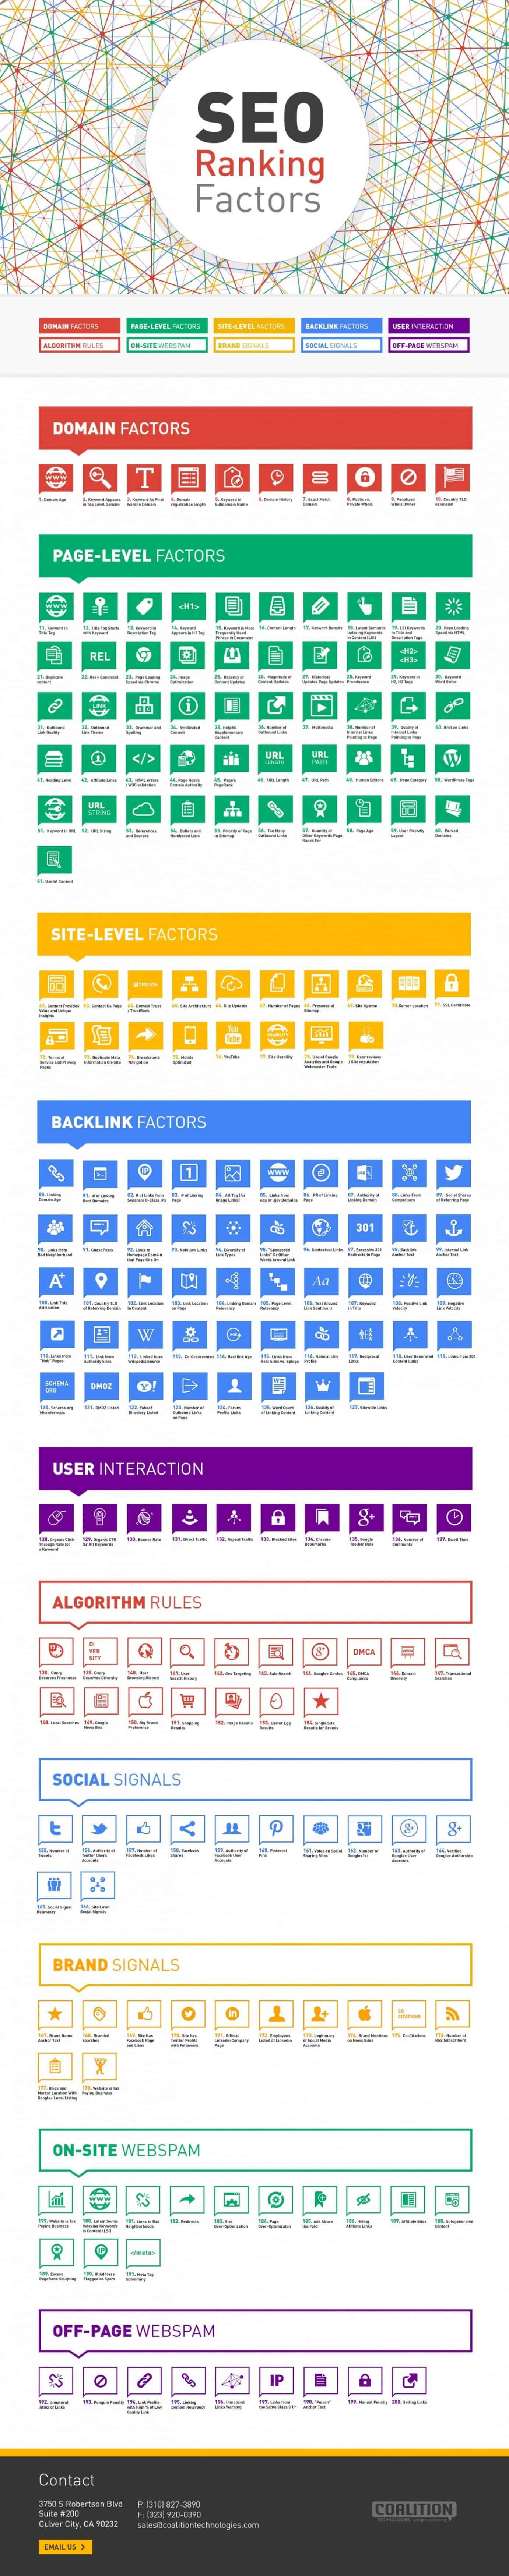 200 SEO Ranking Factors | Visual.ly